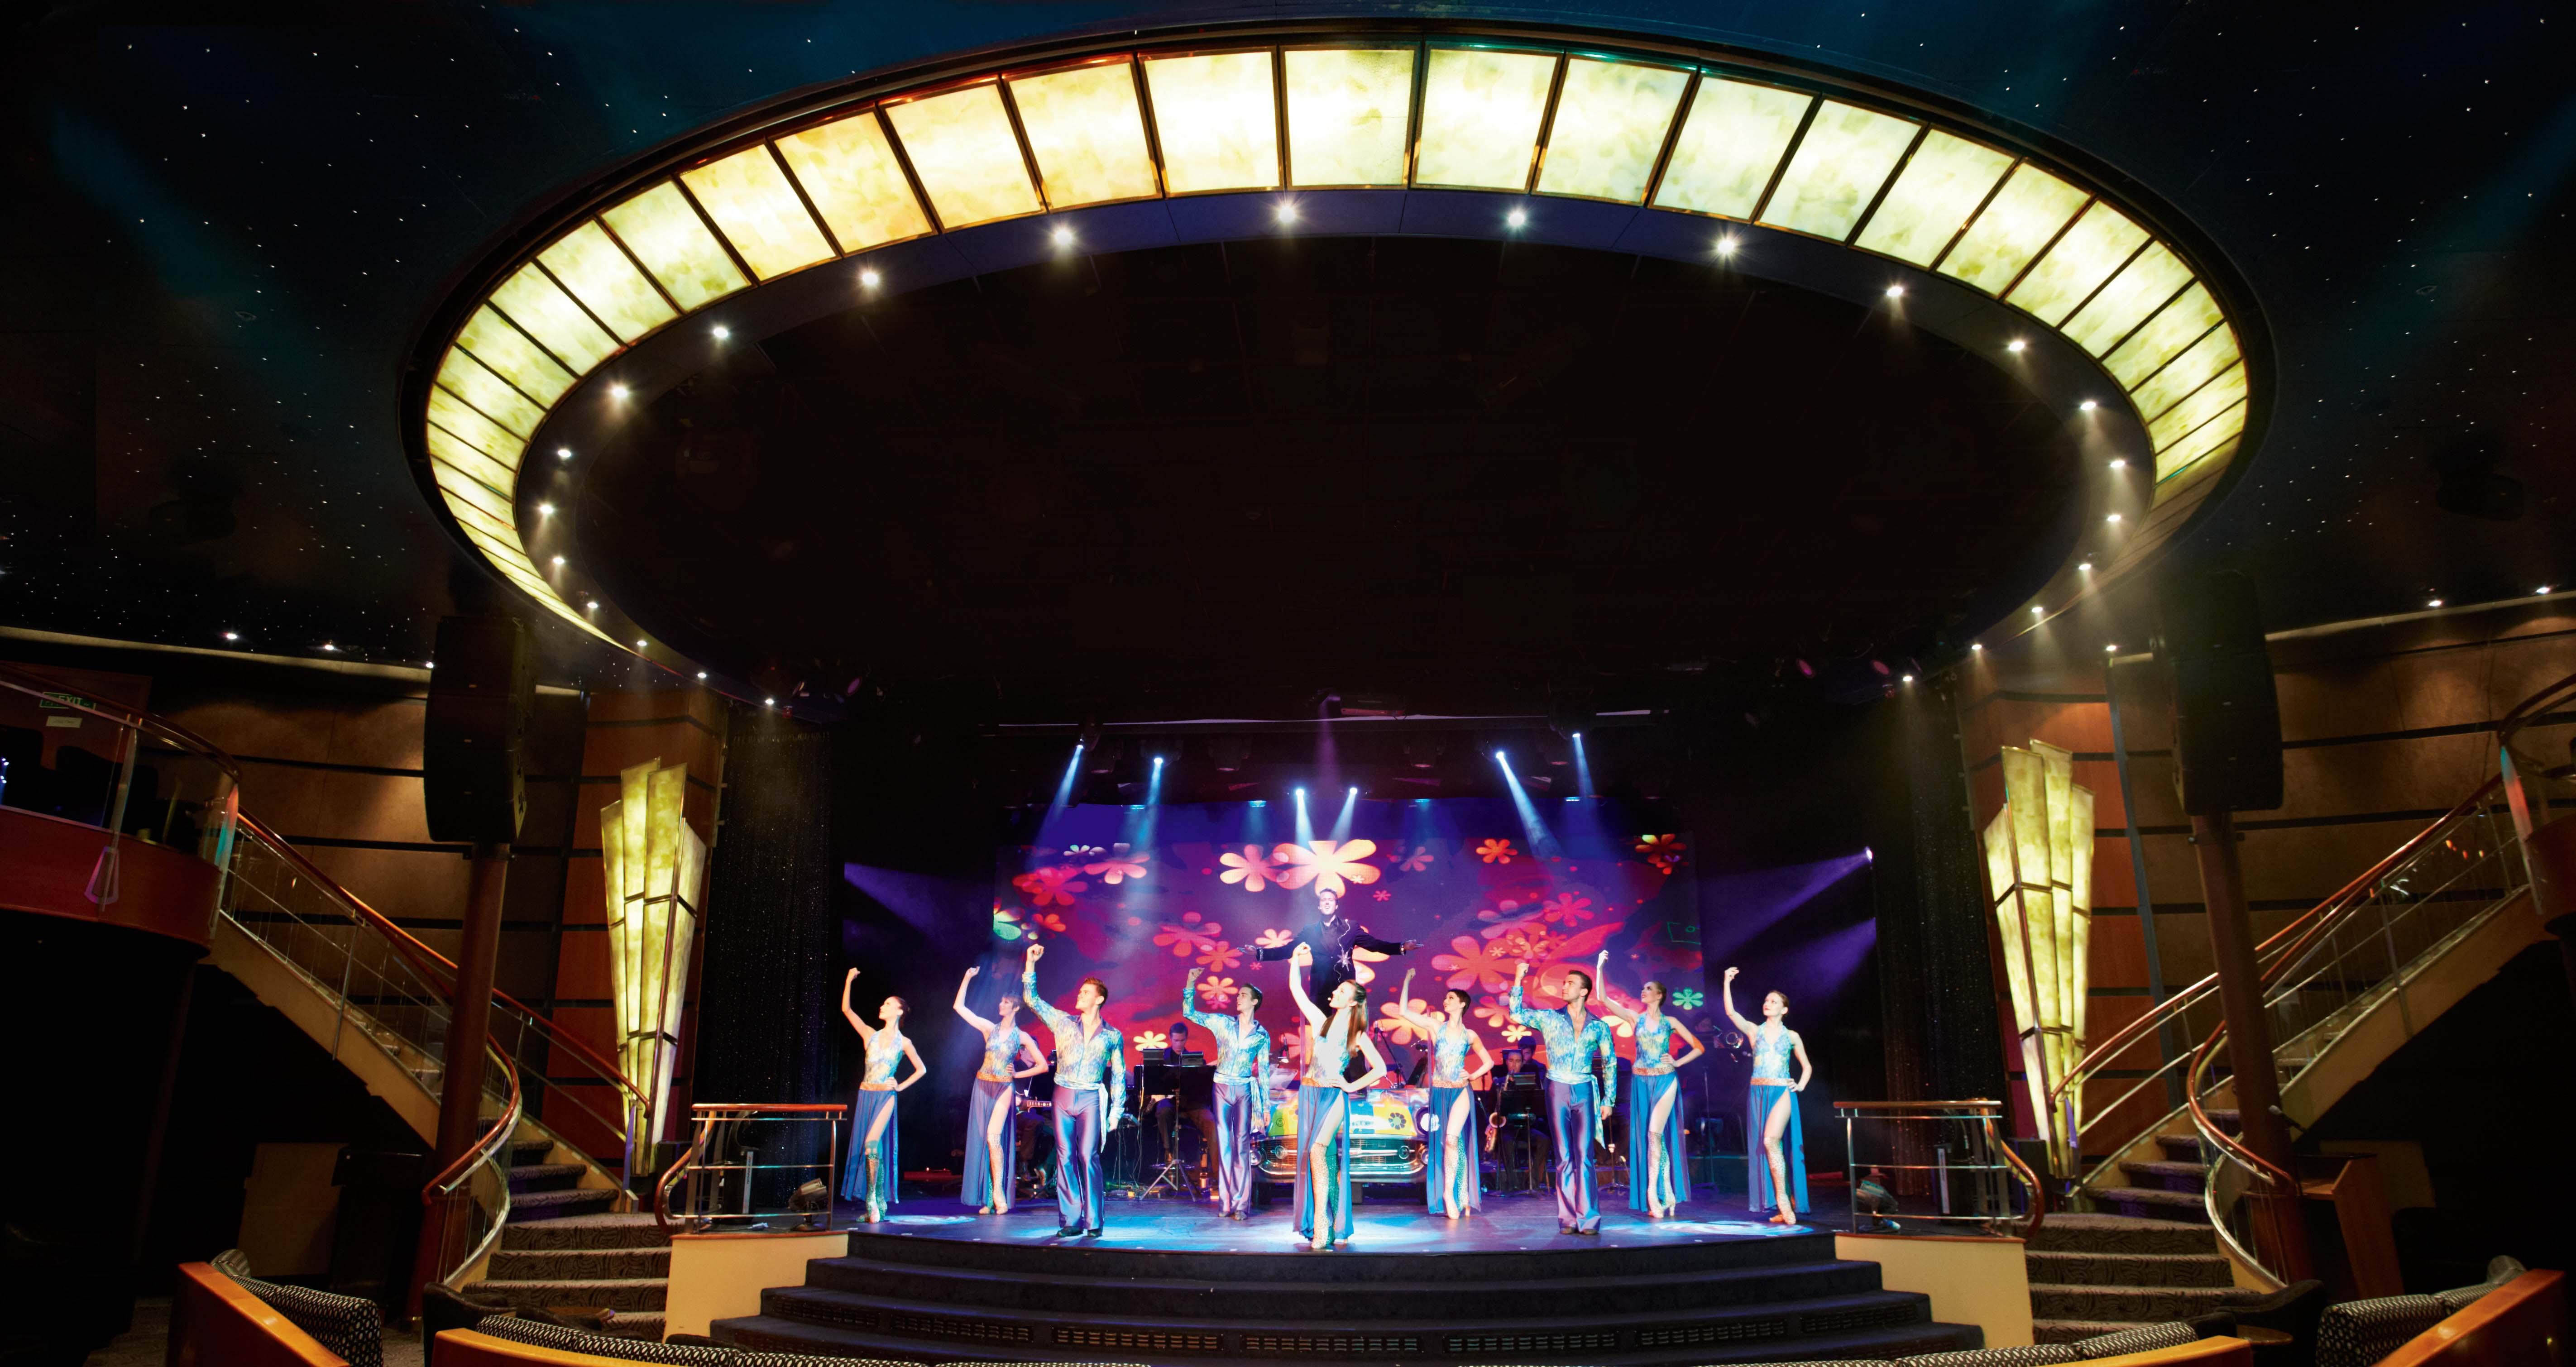 Seven Seas Navigator - Constellation Theater